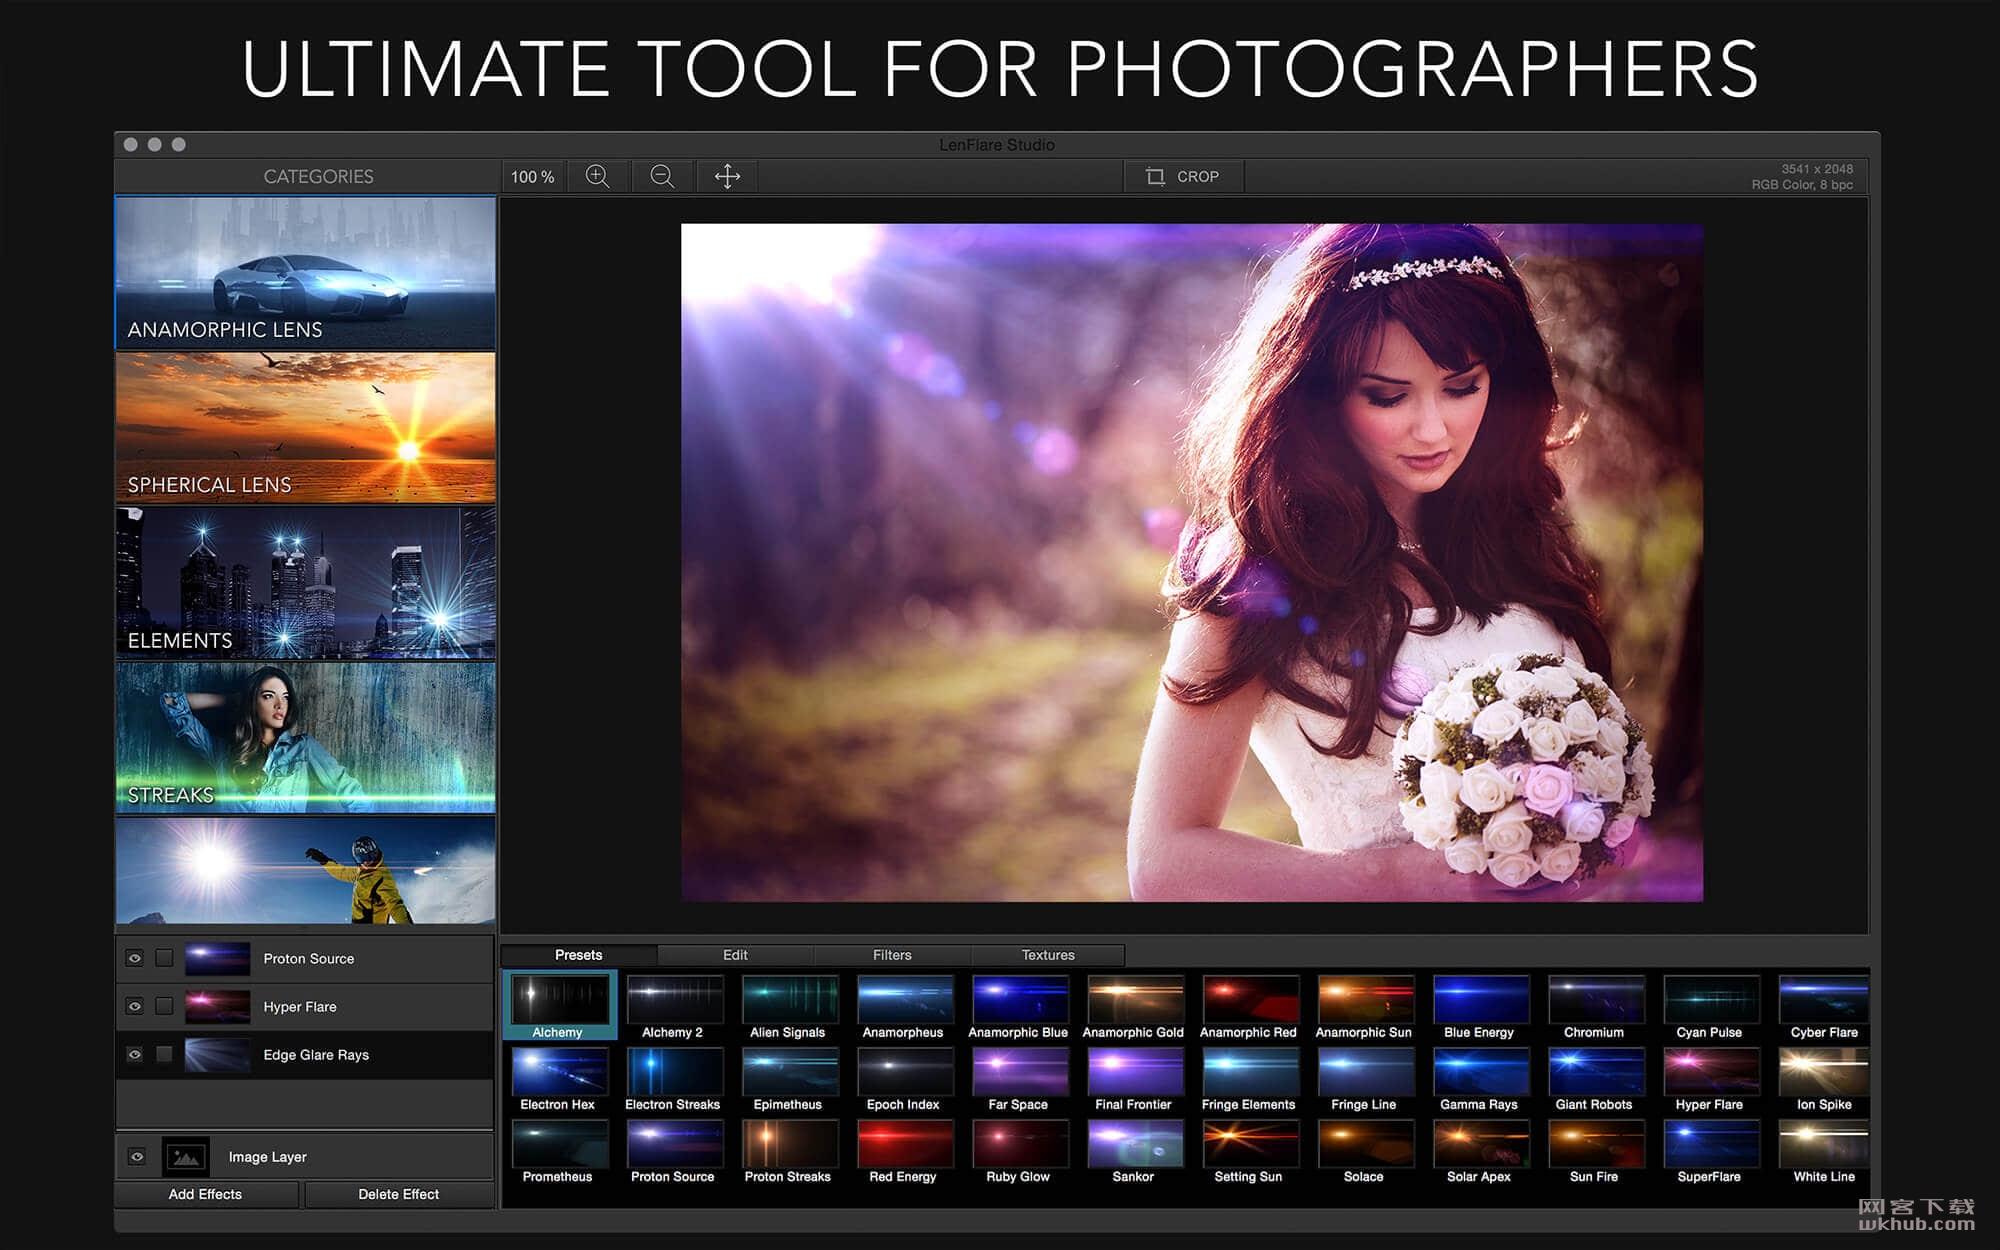 LensFlare Studio 6.5 镜头光晕光效软件